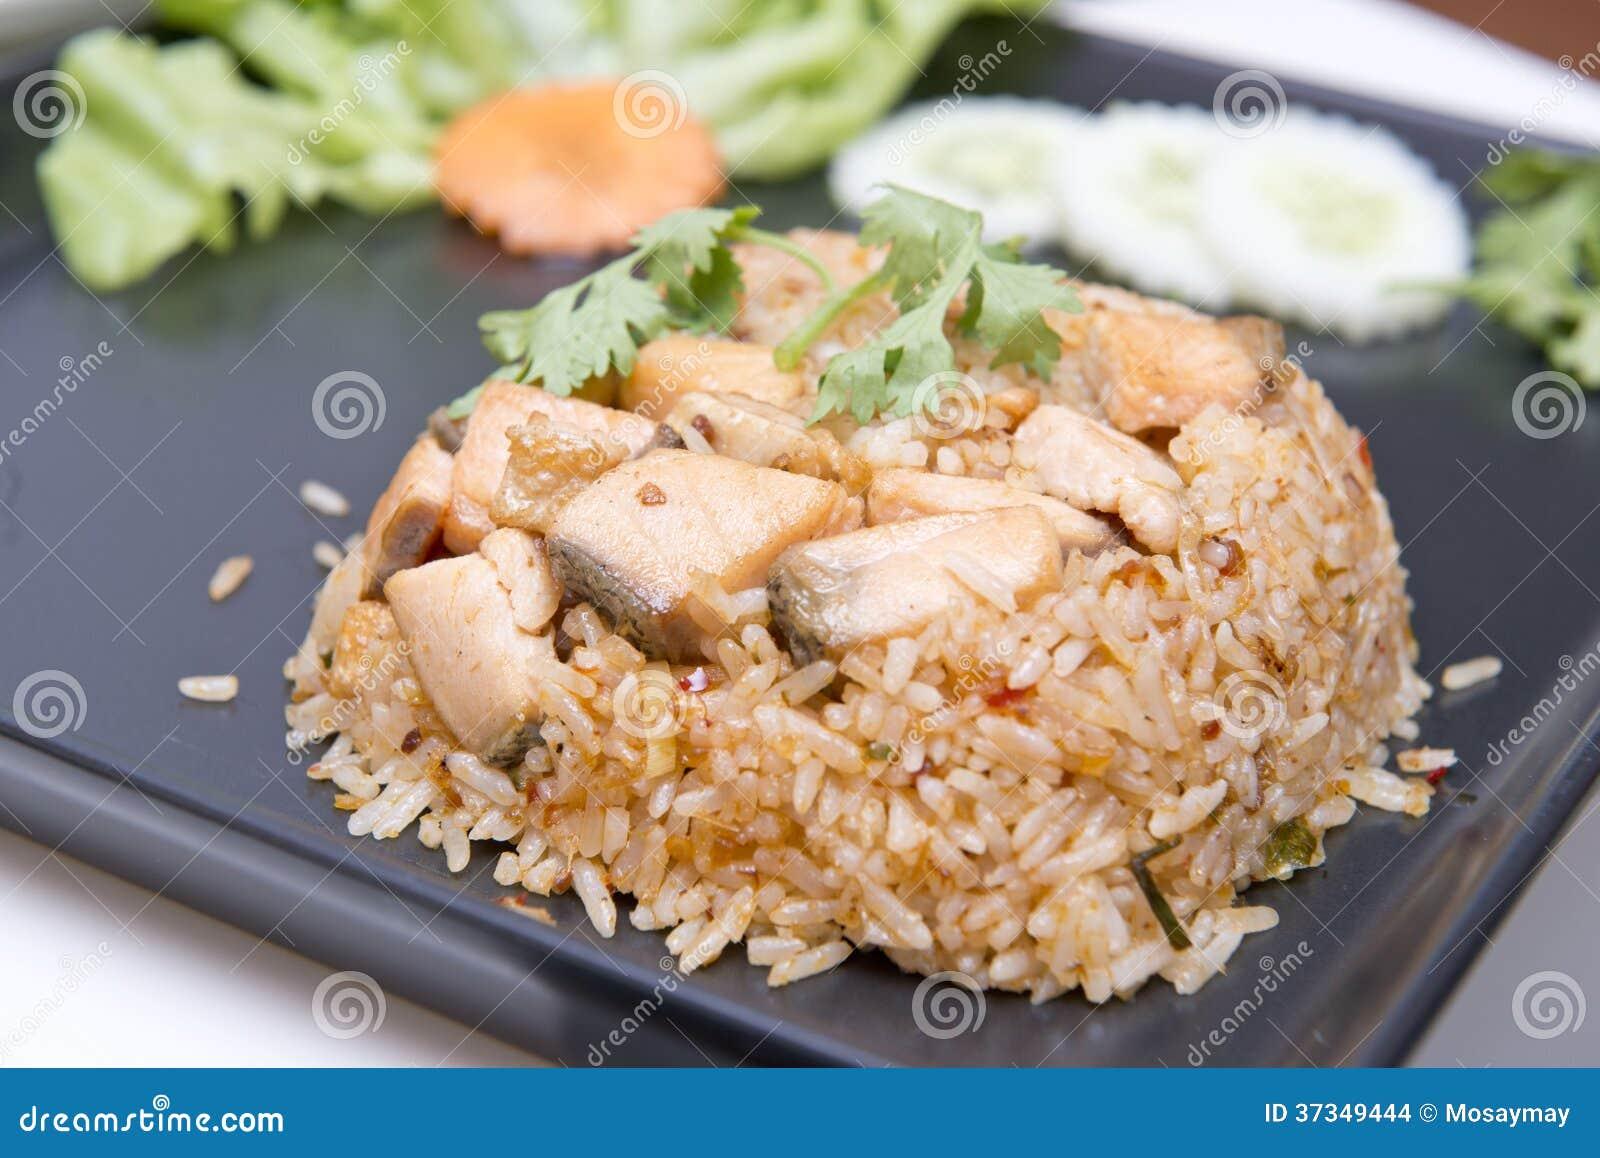 Fried rice garlic with roast salmon